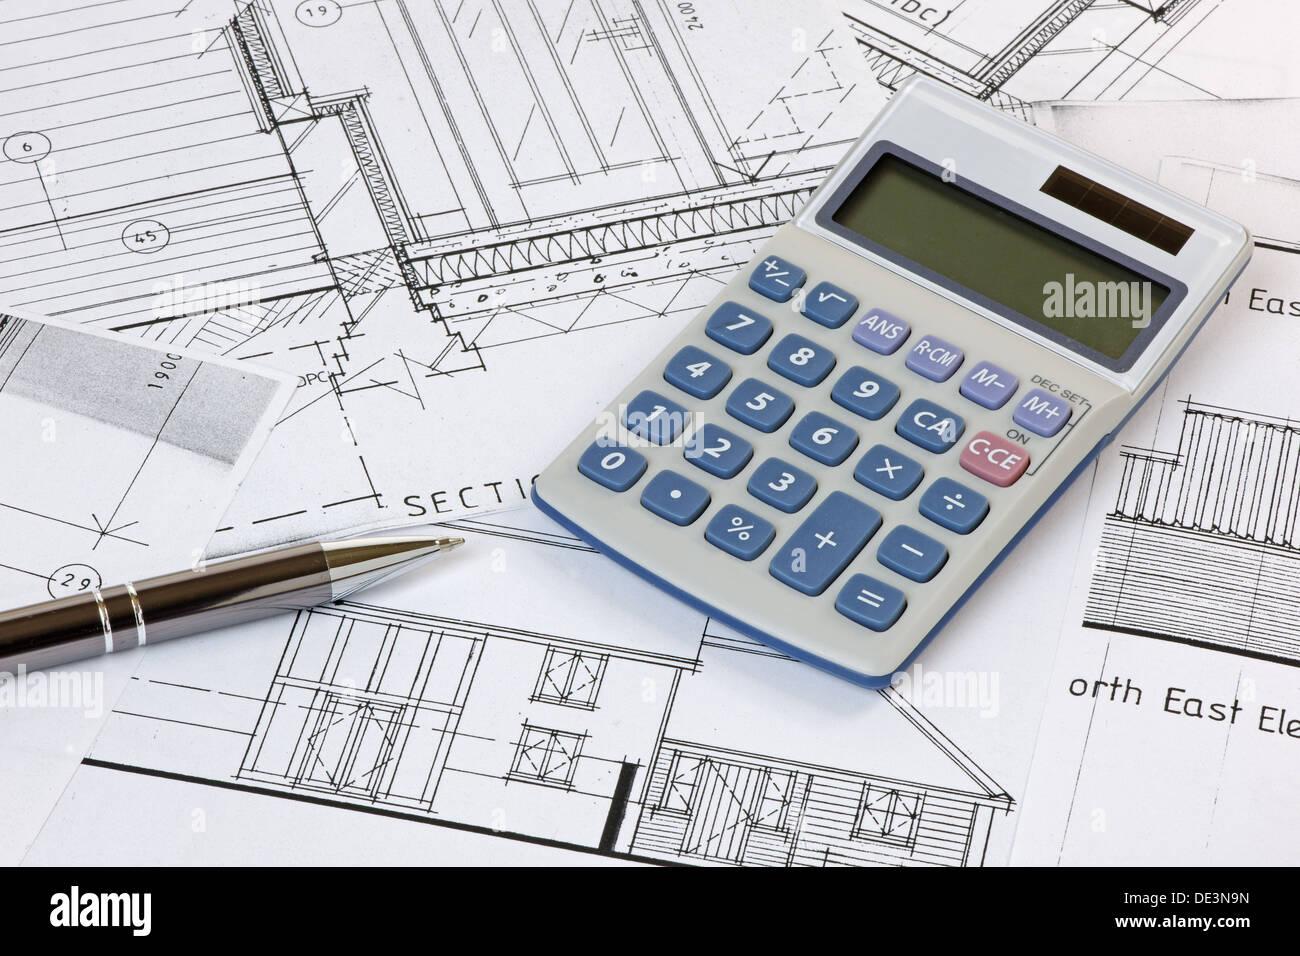 House plans calculator house design plans for Building a home calculator